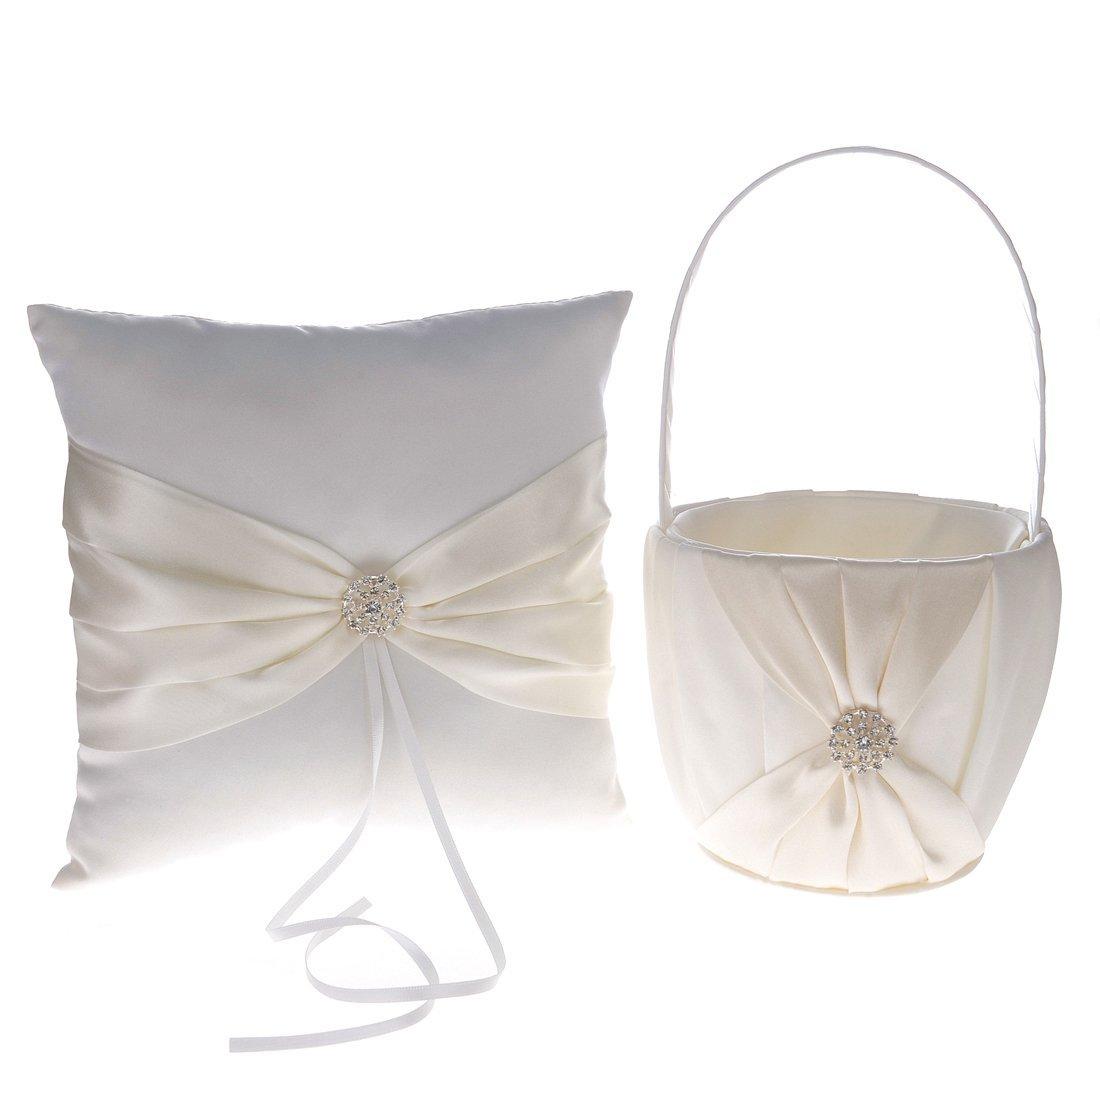 Remedios Champagne Ribbon Rhinestone Wedding Flower Basket Ring Pillow LWCAHLJZ130014